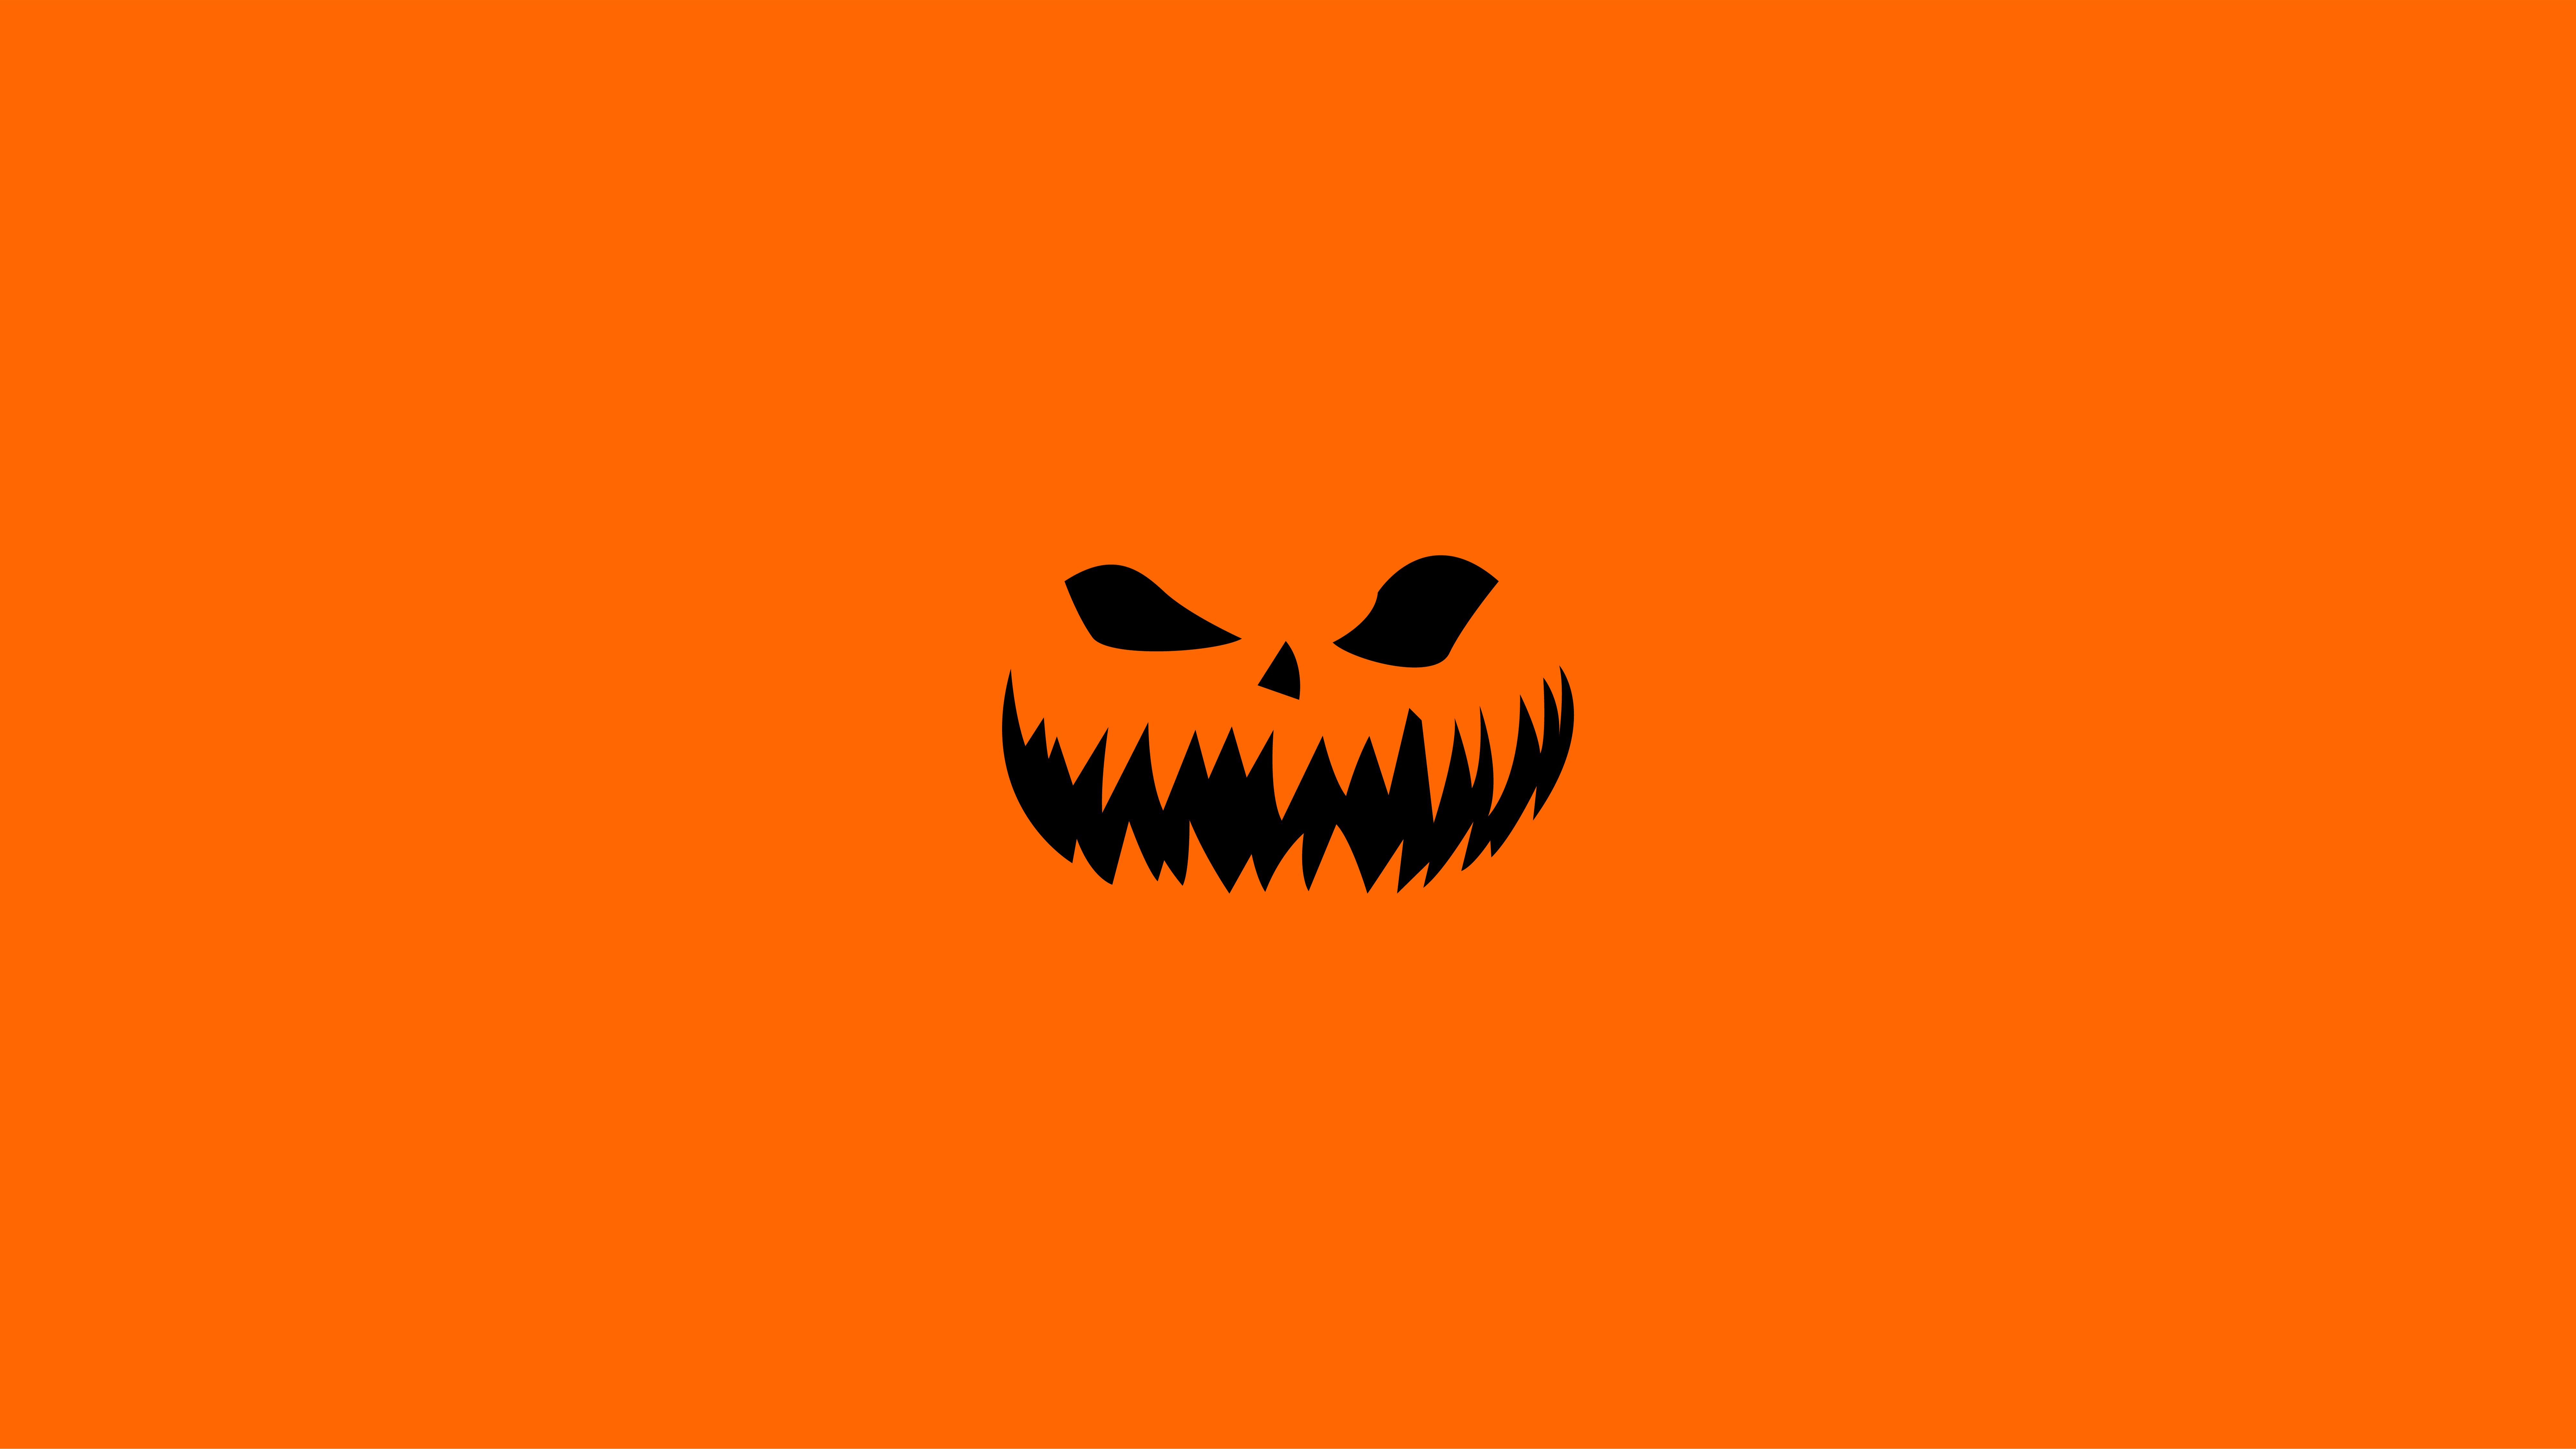 Halloween 8k Ultra Hd Wallpaper Hintergrund 8000x4500